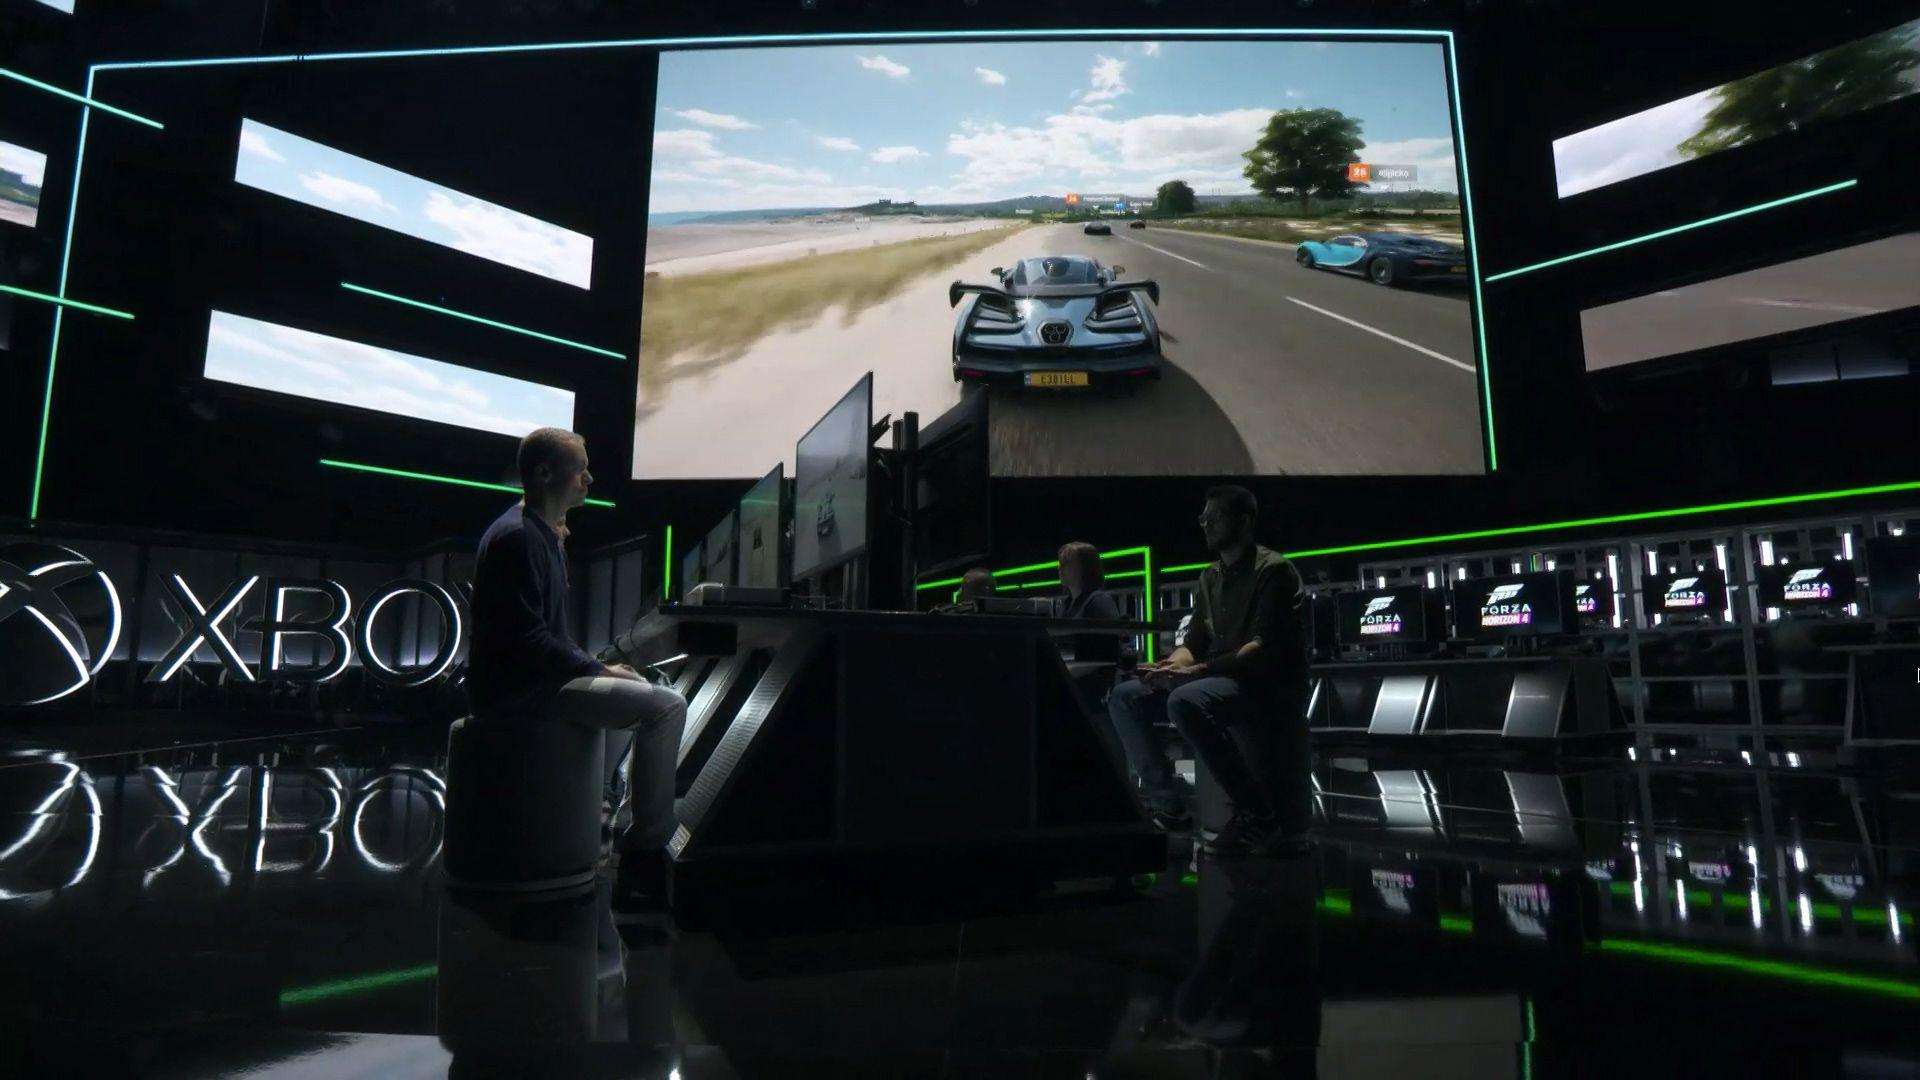 Forza Horizon 4's seasons (and sheep) will change weekly